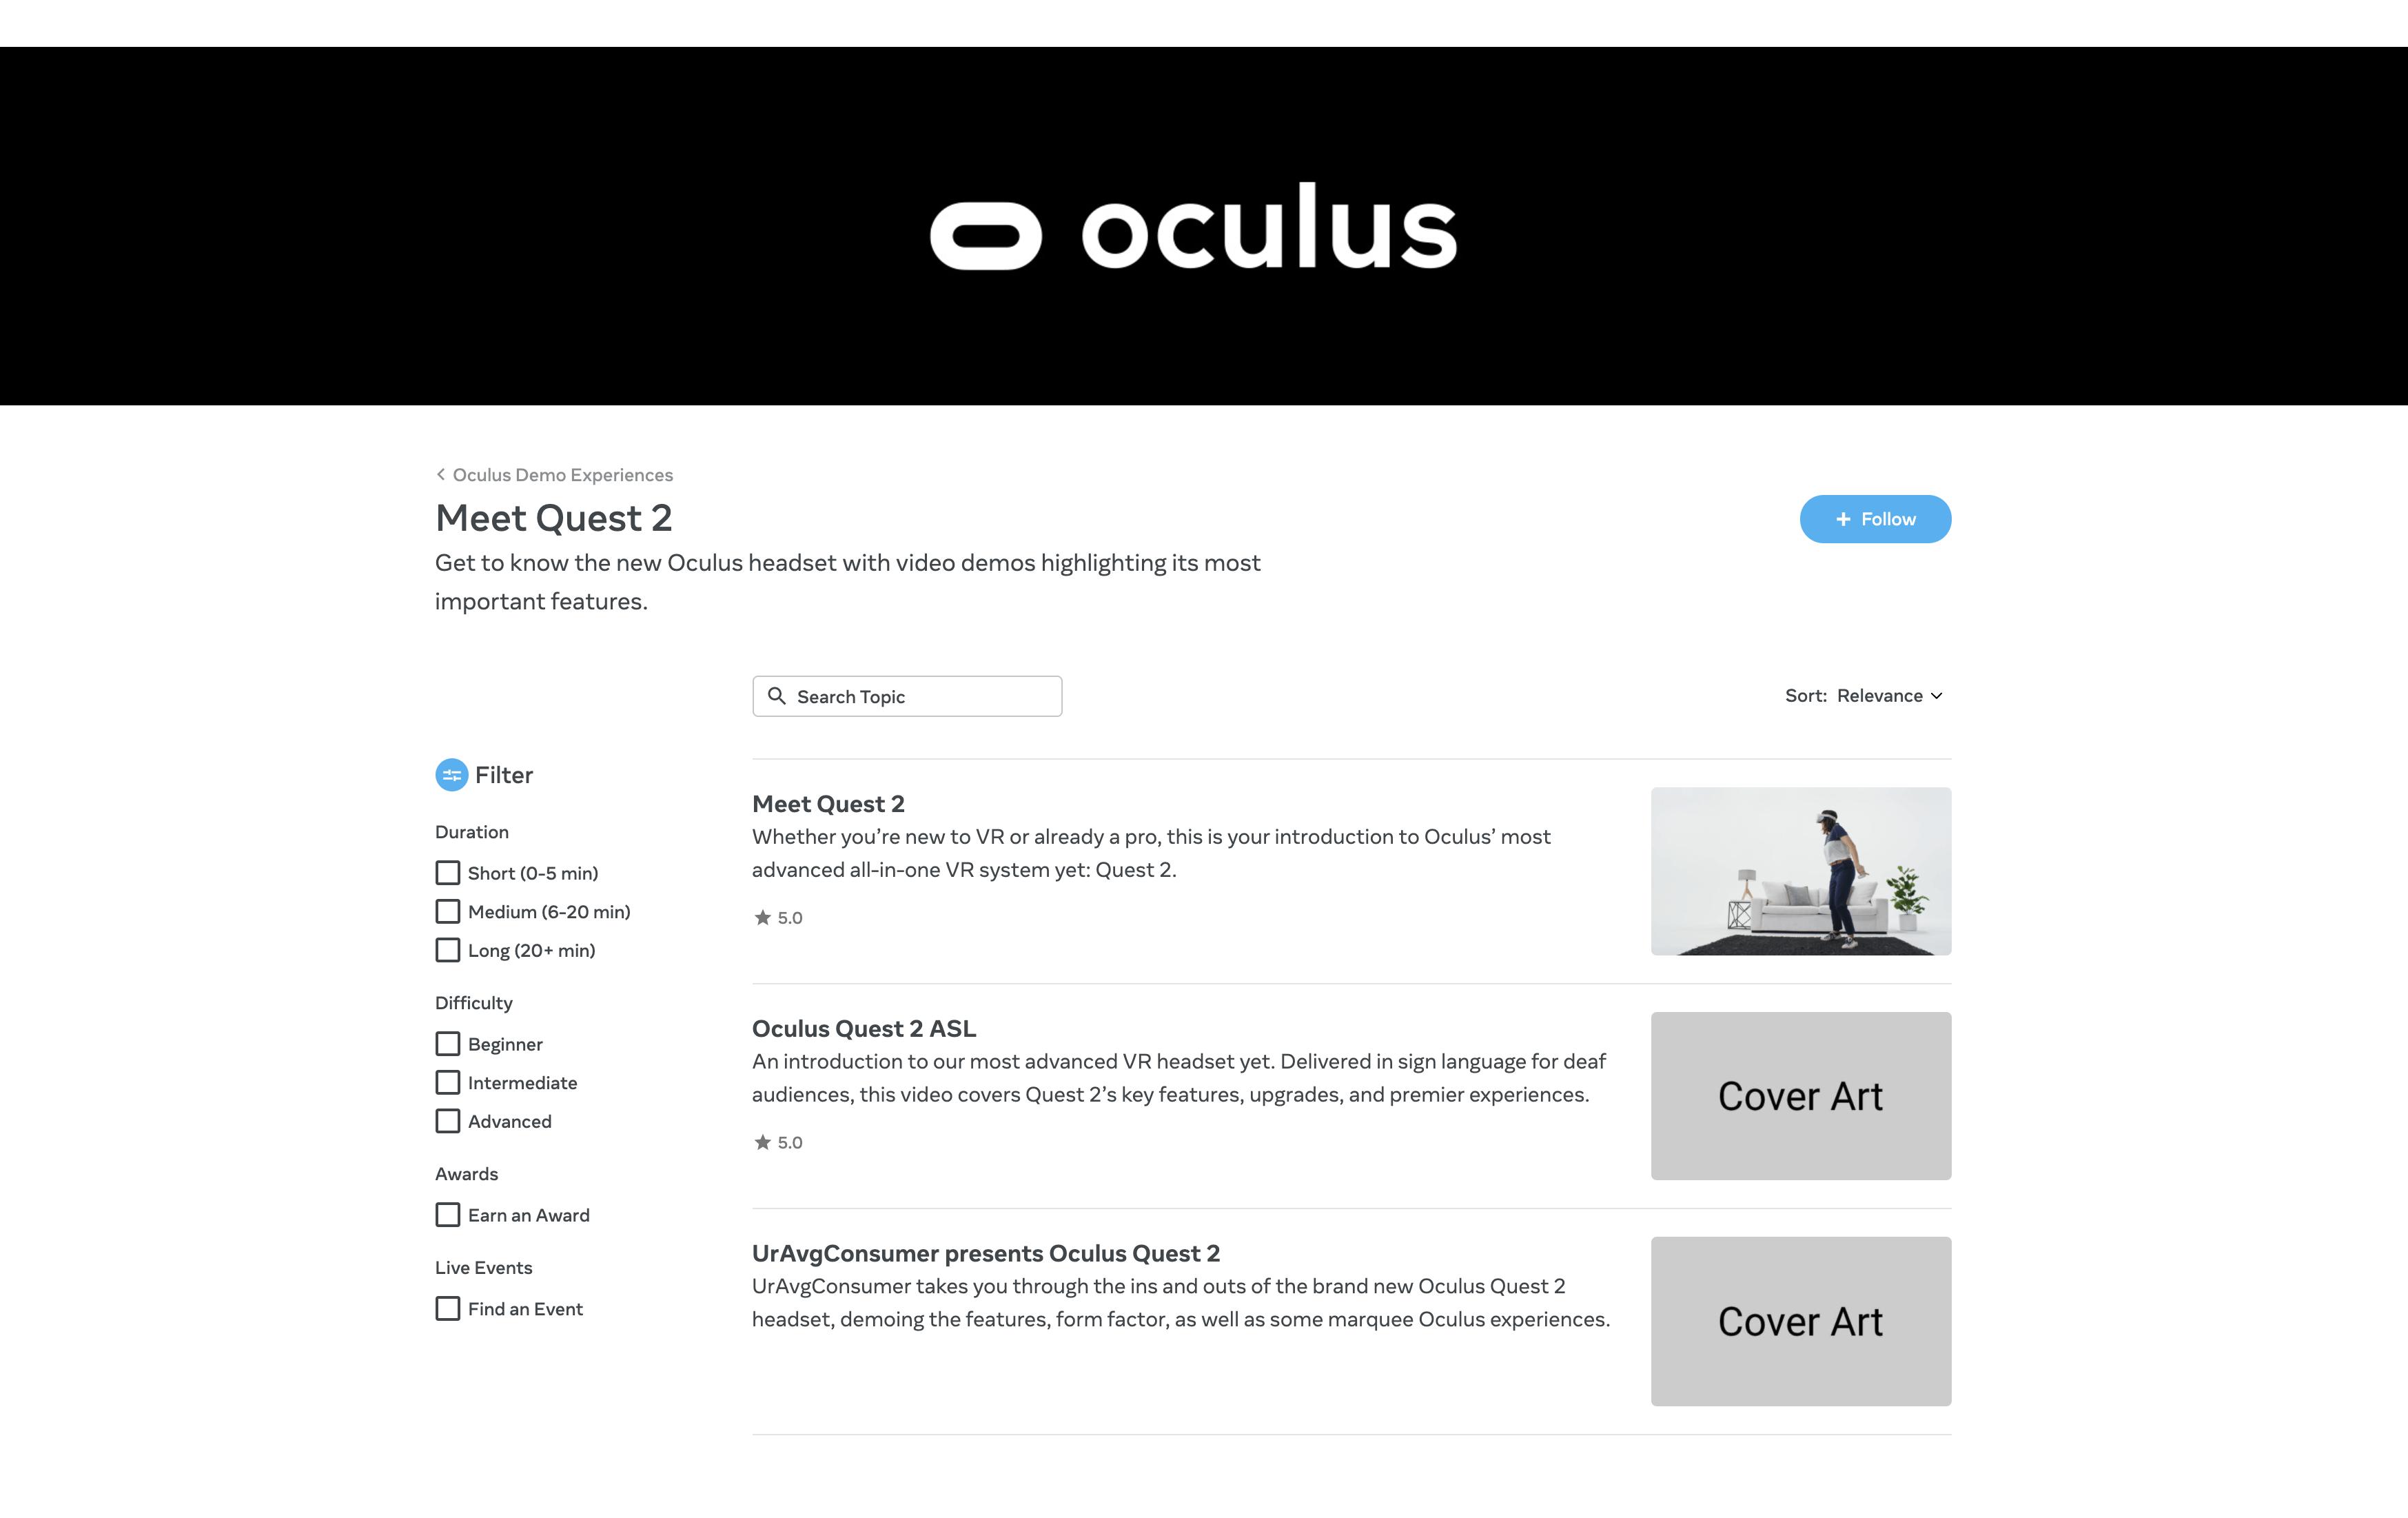 L'Oculus Quest 2 fuite avant l'heure